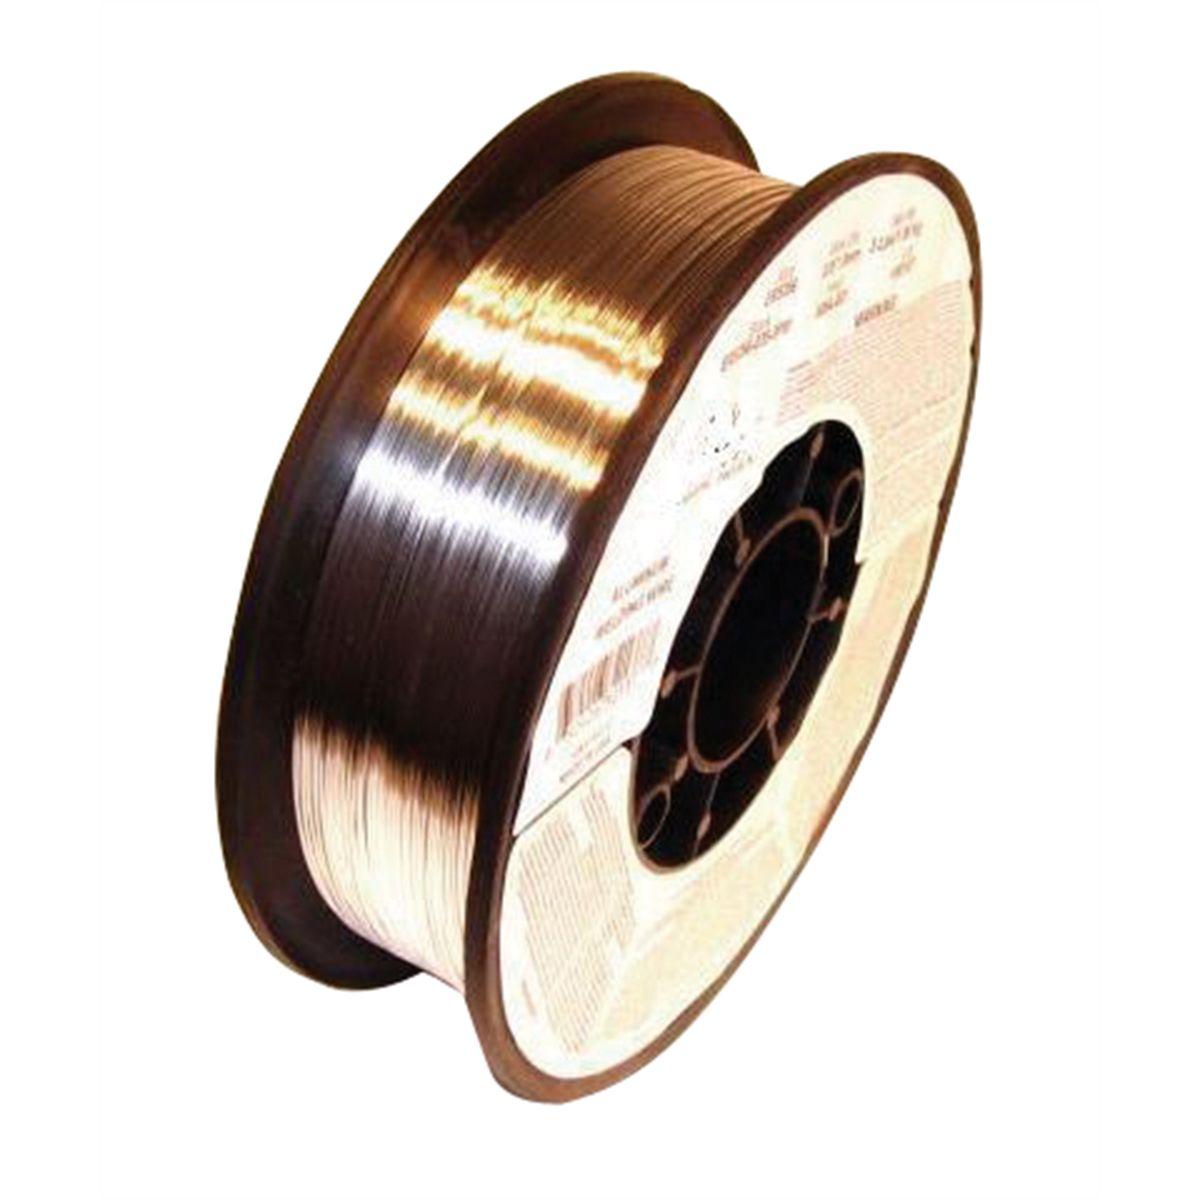 035 Aluminum ER5356 10 Lb. Welding Wire 8 Spool | Mountain | WEW-6445